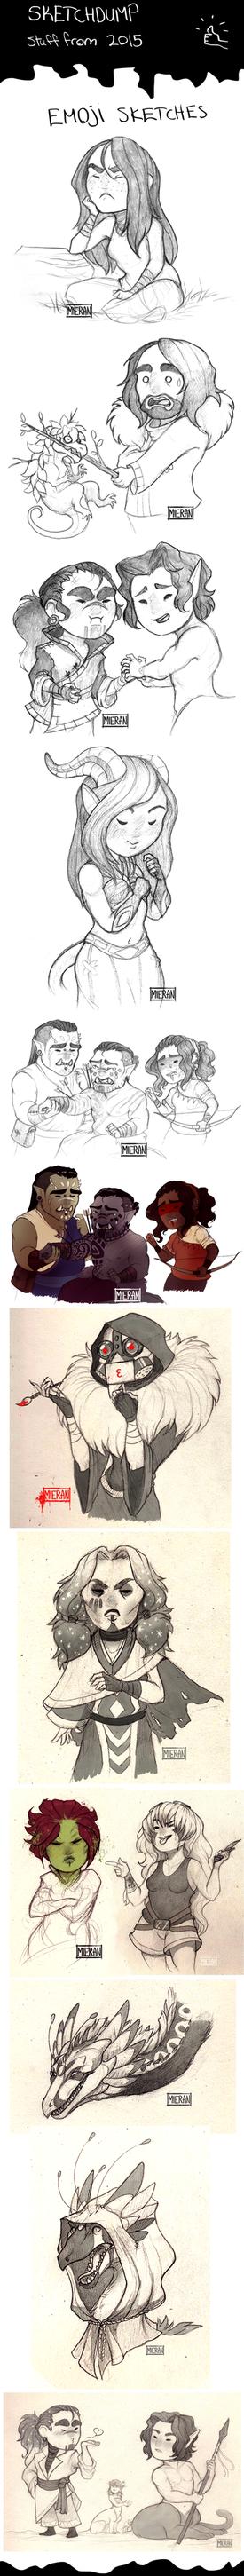 Emoji sketchdump 2015 by TheSnowDragon